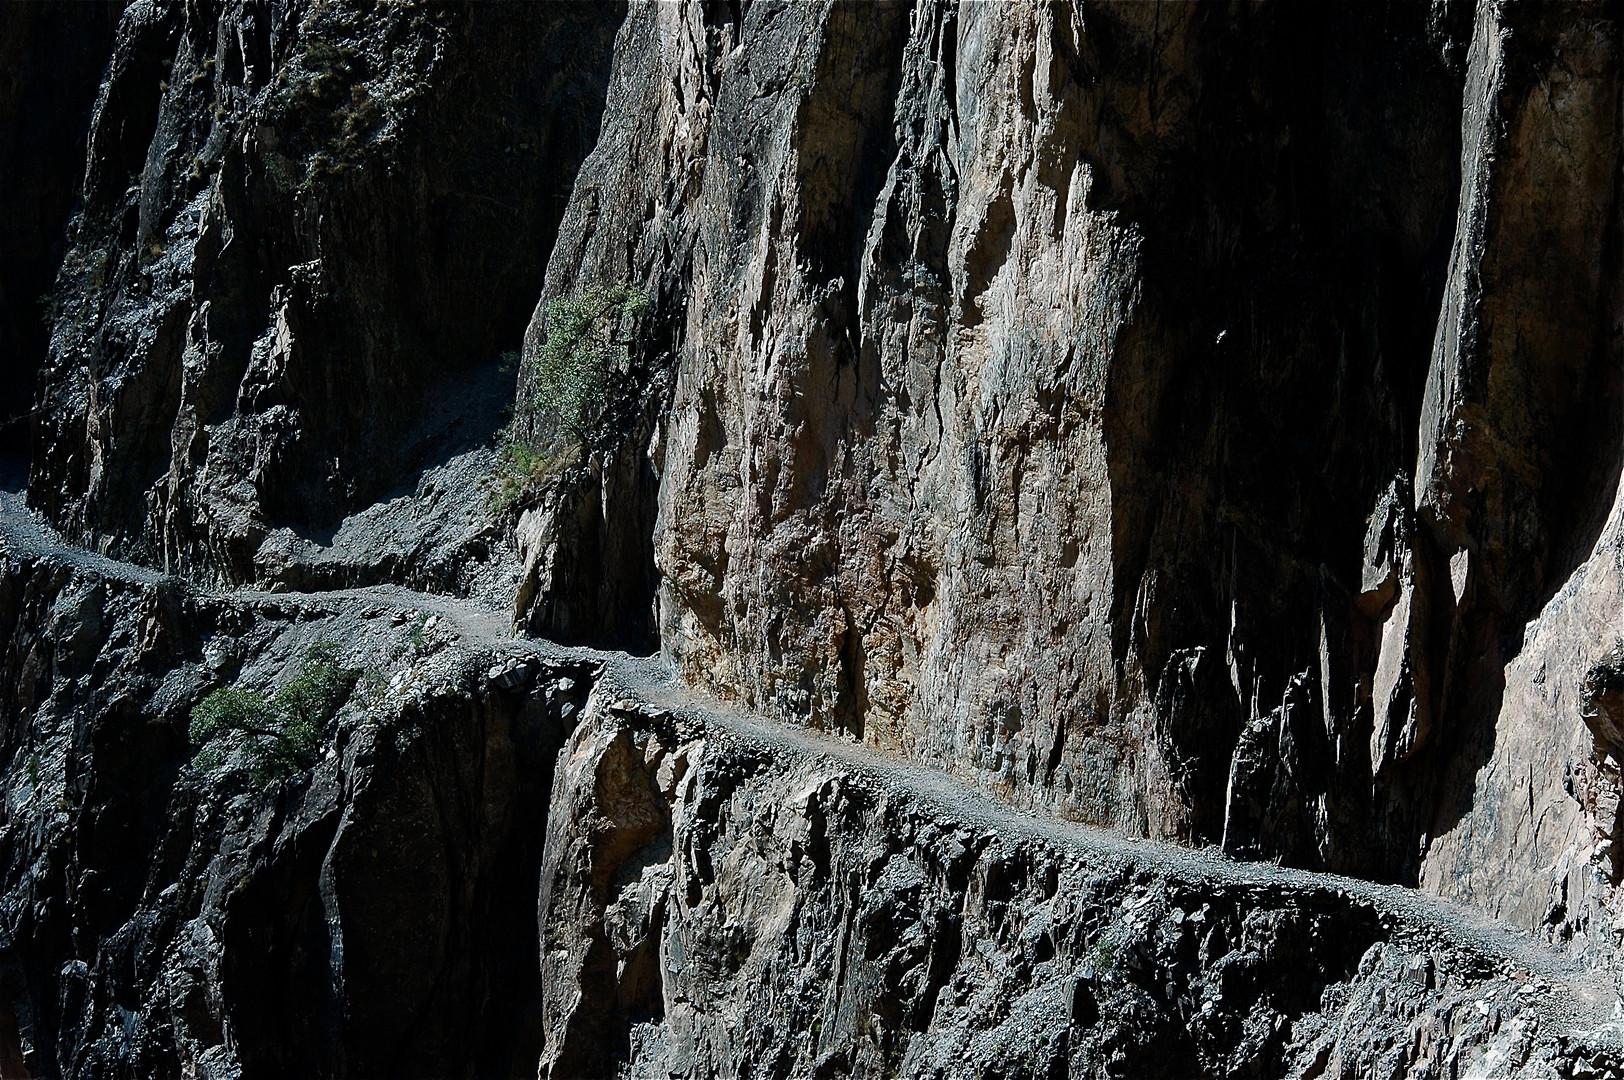 Tea Horse 'Road' - Yunnan